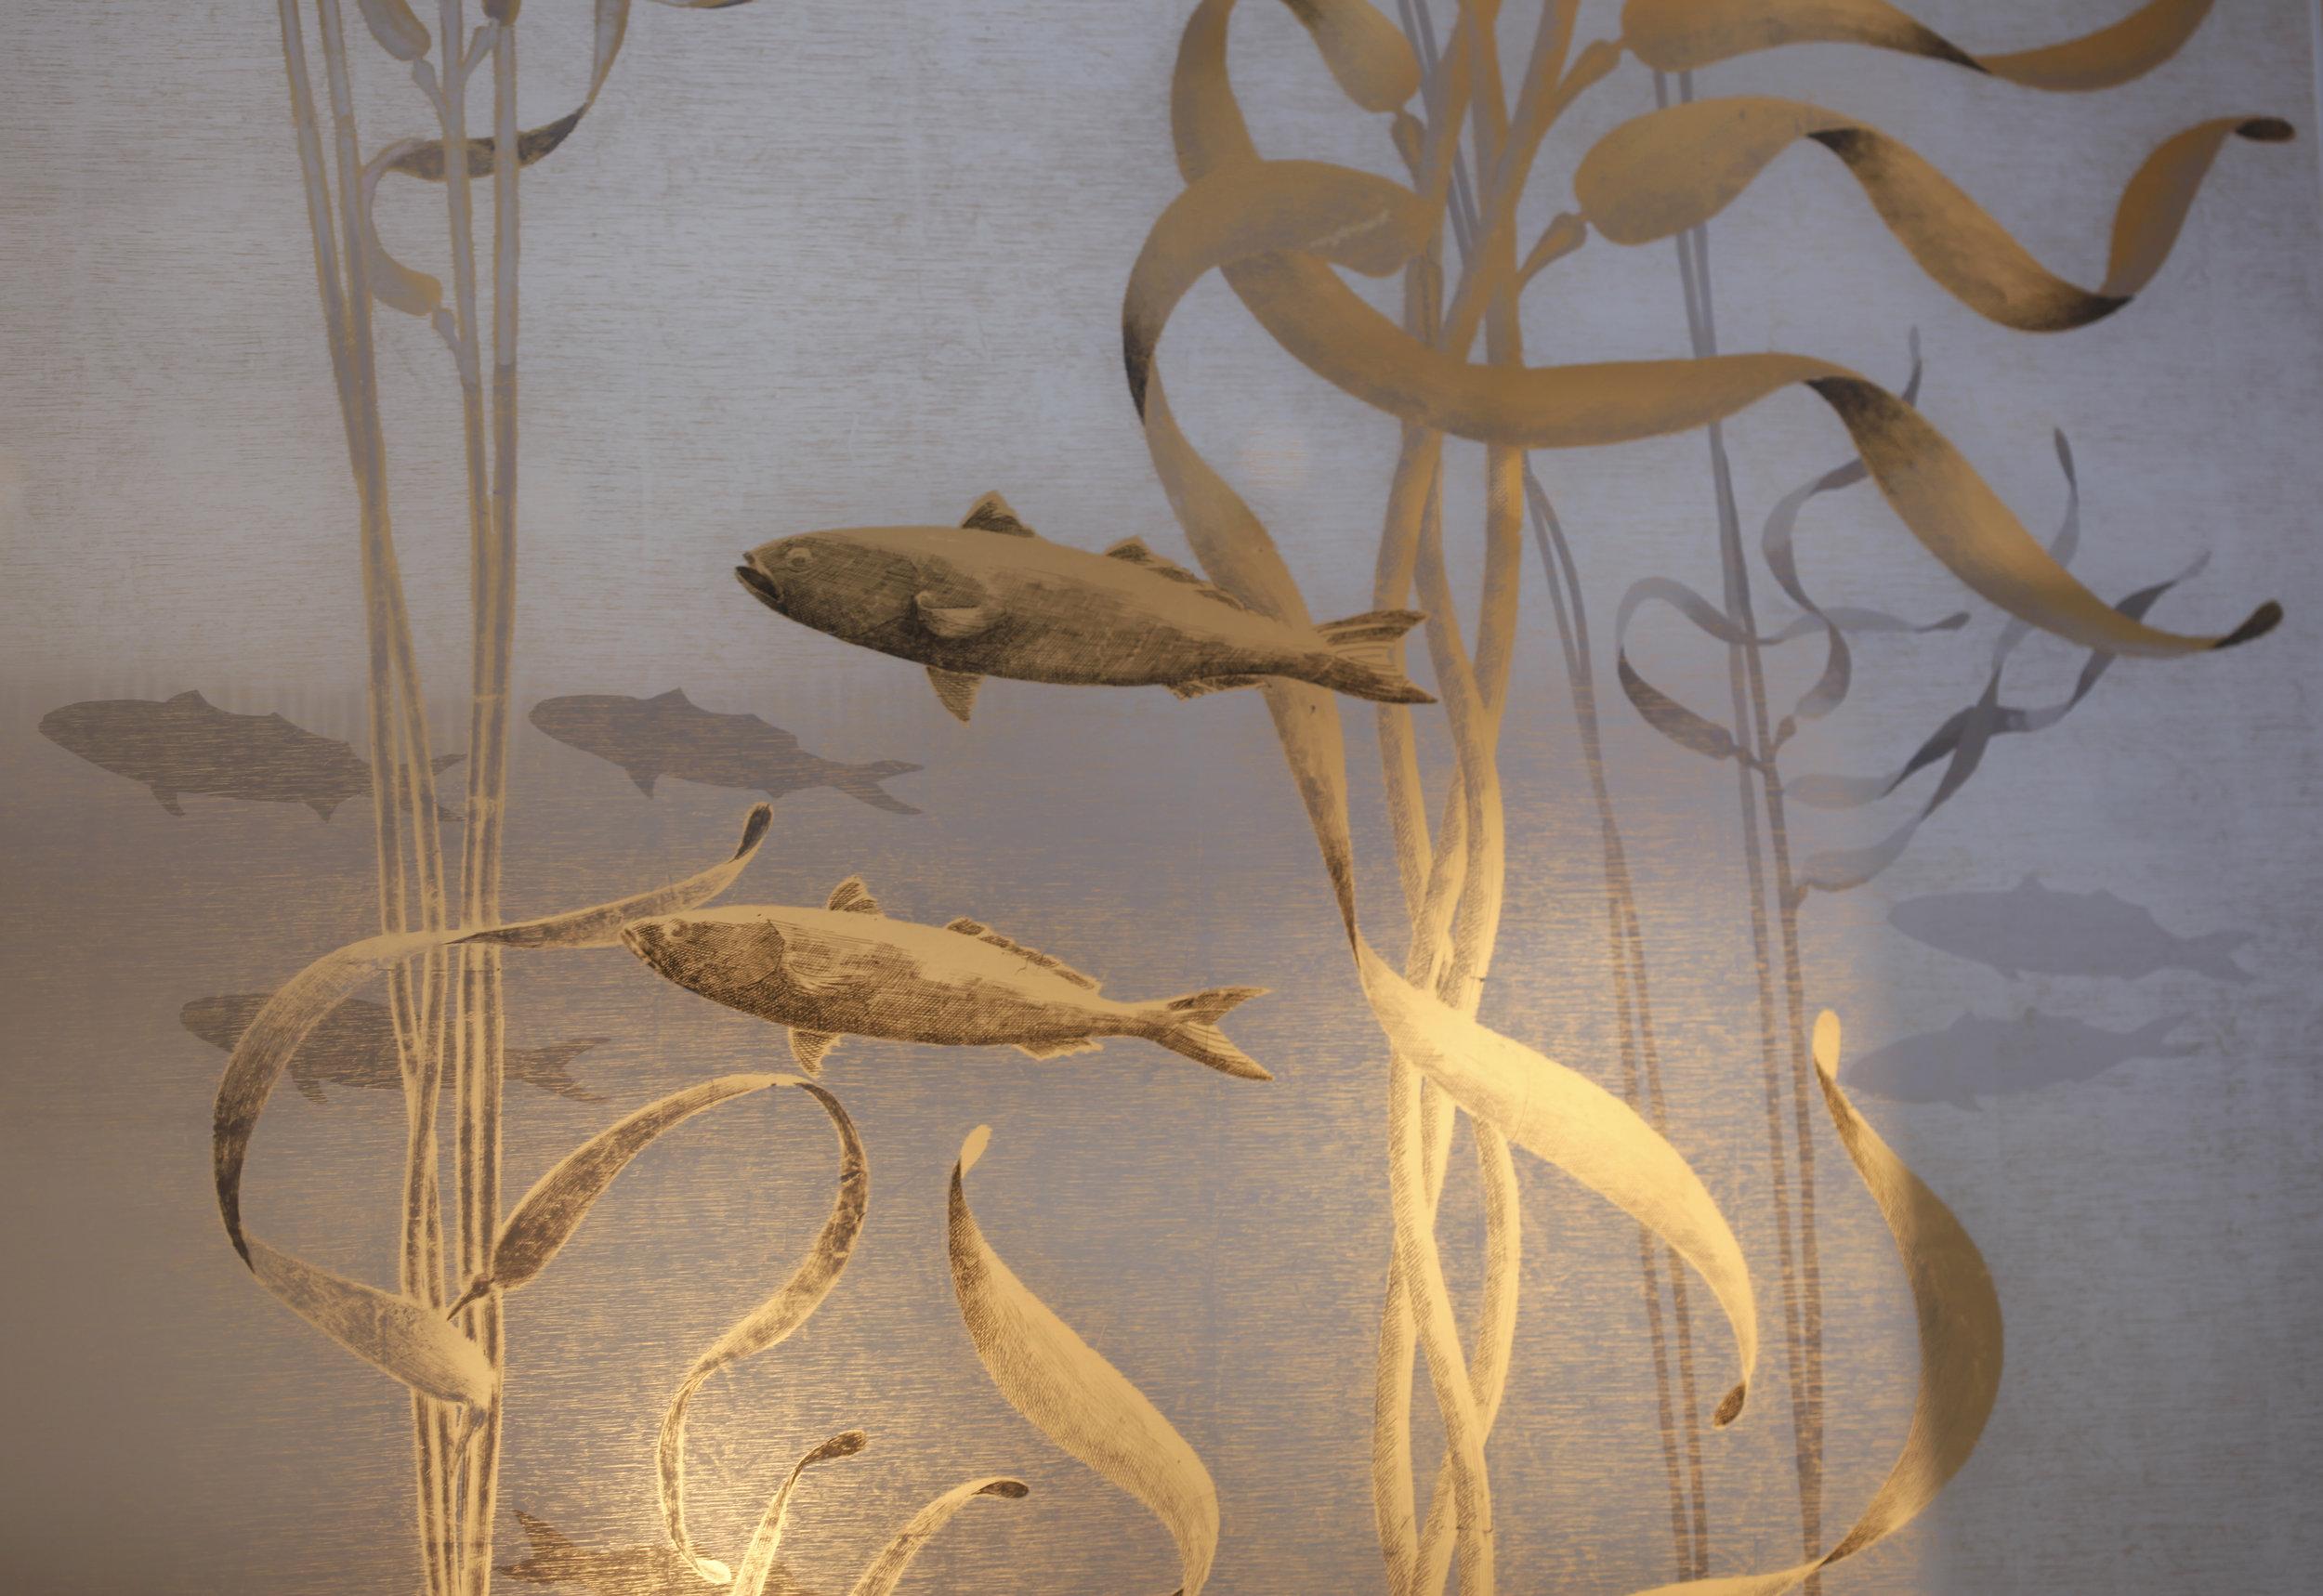 #2_SCHOOL OF FISH EGLOMISE GLASS MURAL_VILLAFRANCA STUDIO.jpg